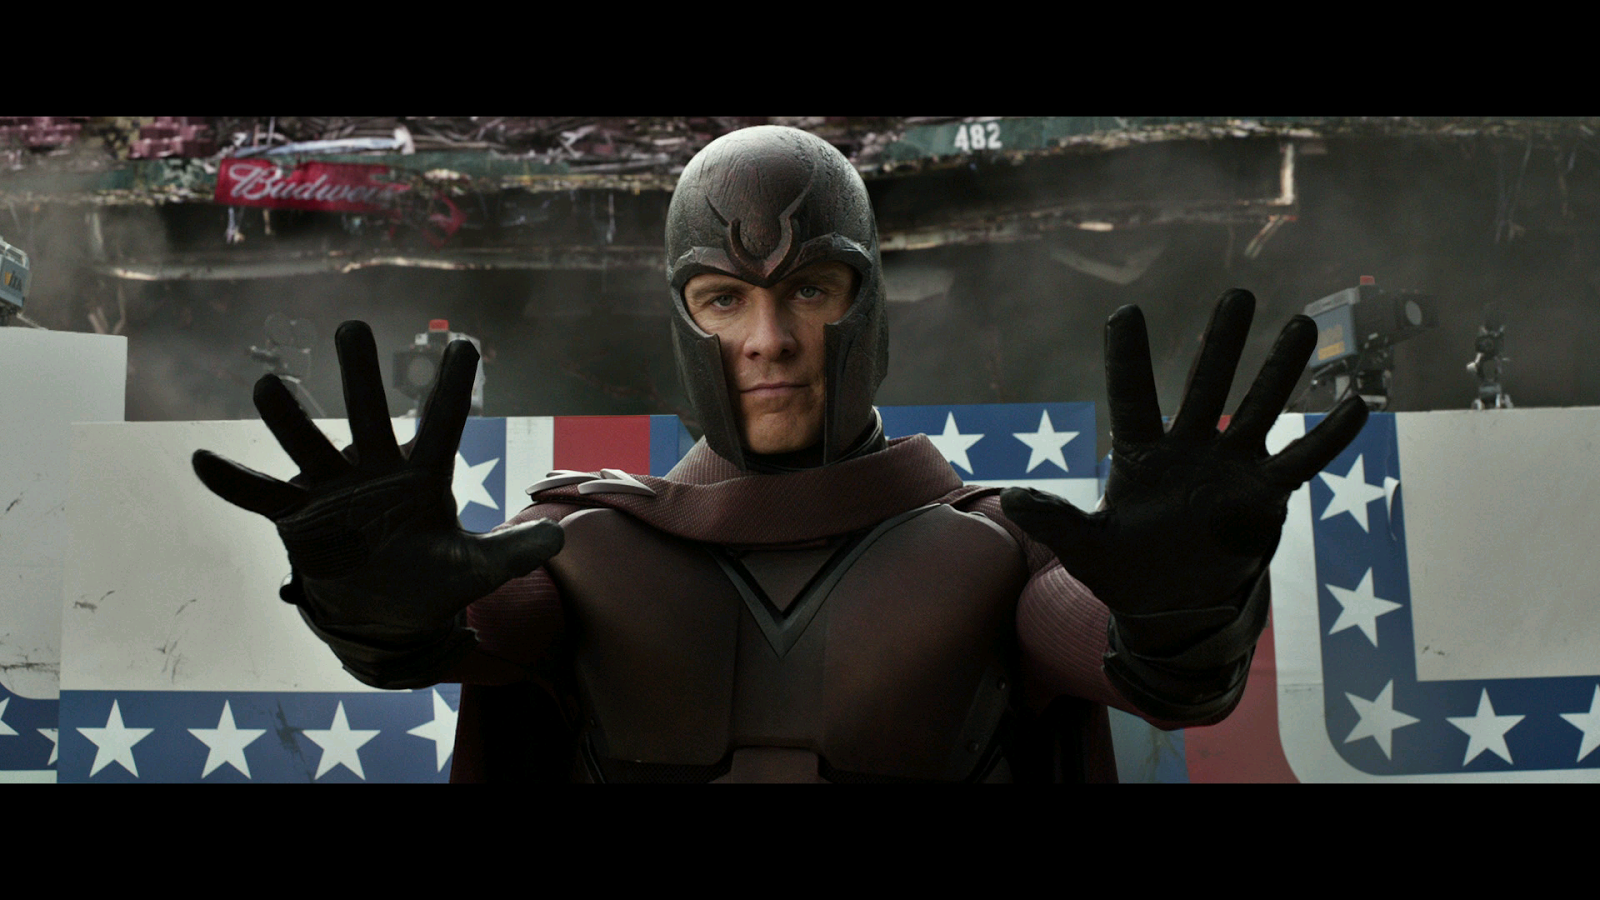 X-Men Días Del Futuro Pasado (2014) 2D + 3D 1080p BD25 6